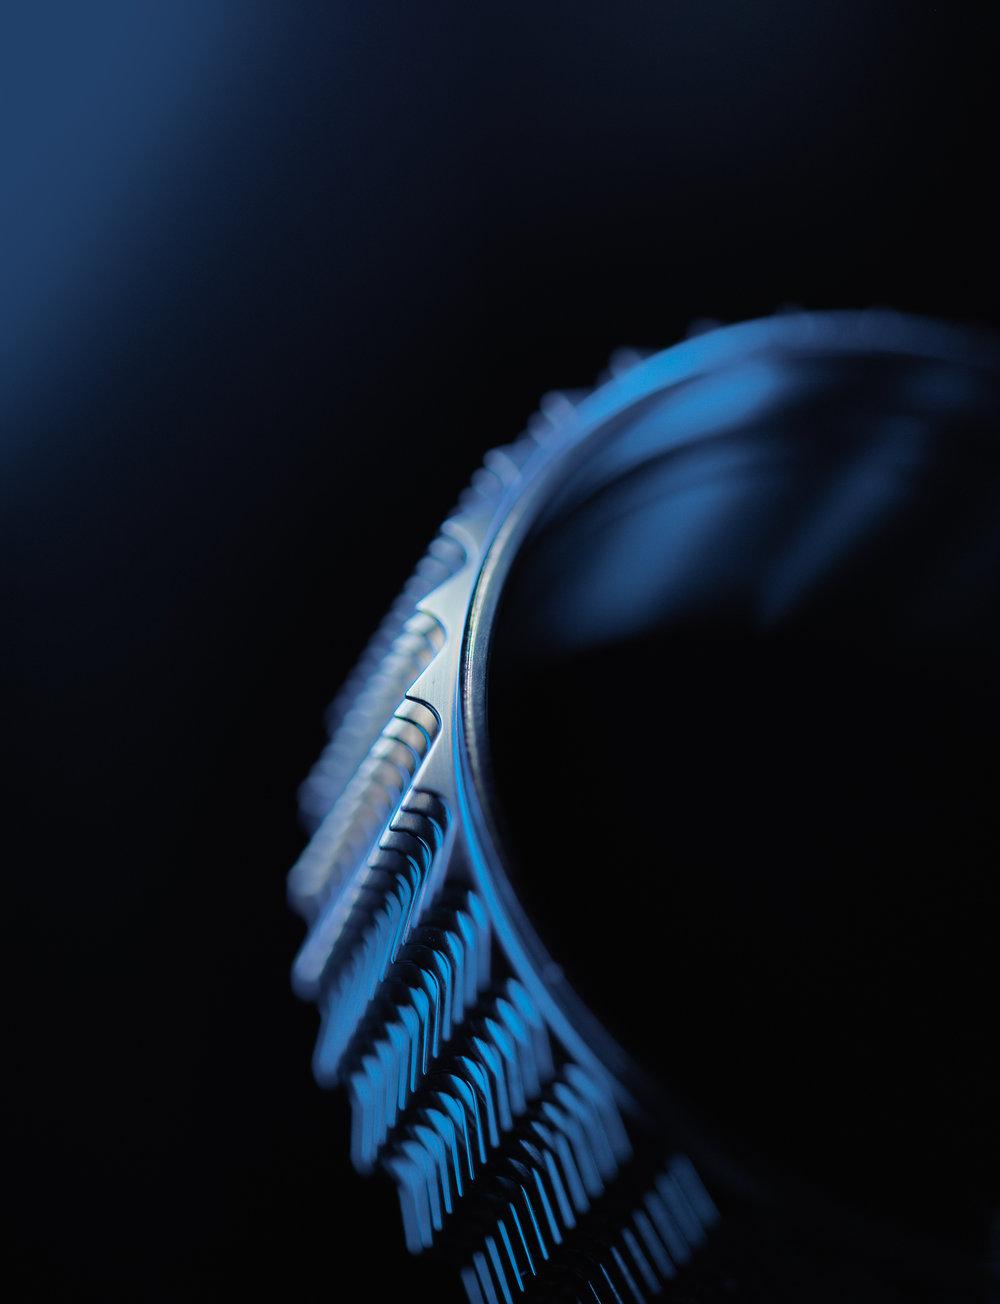 Rieter Premium Textile Components